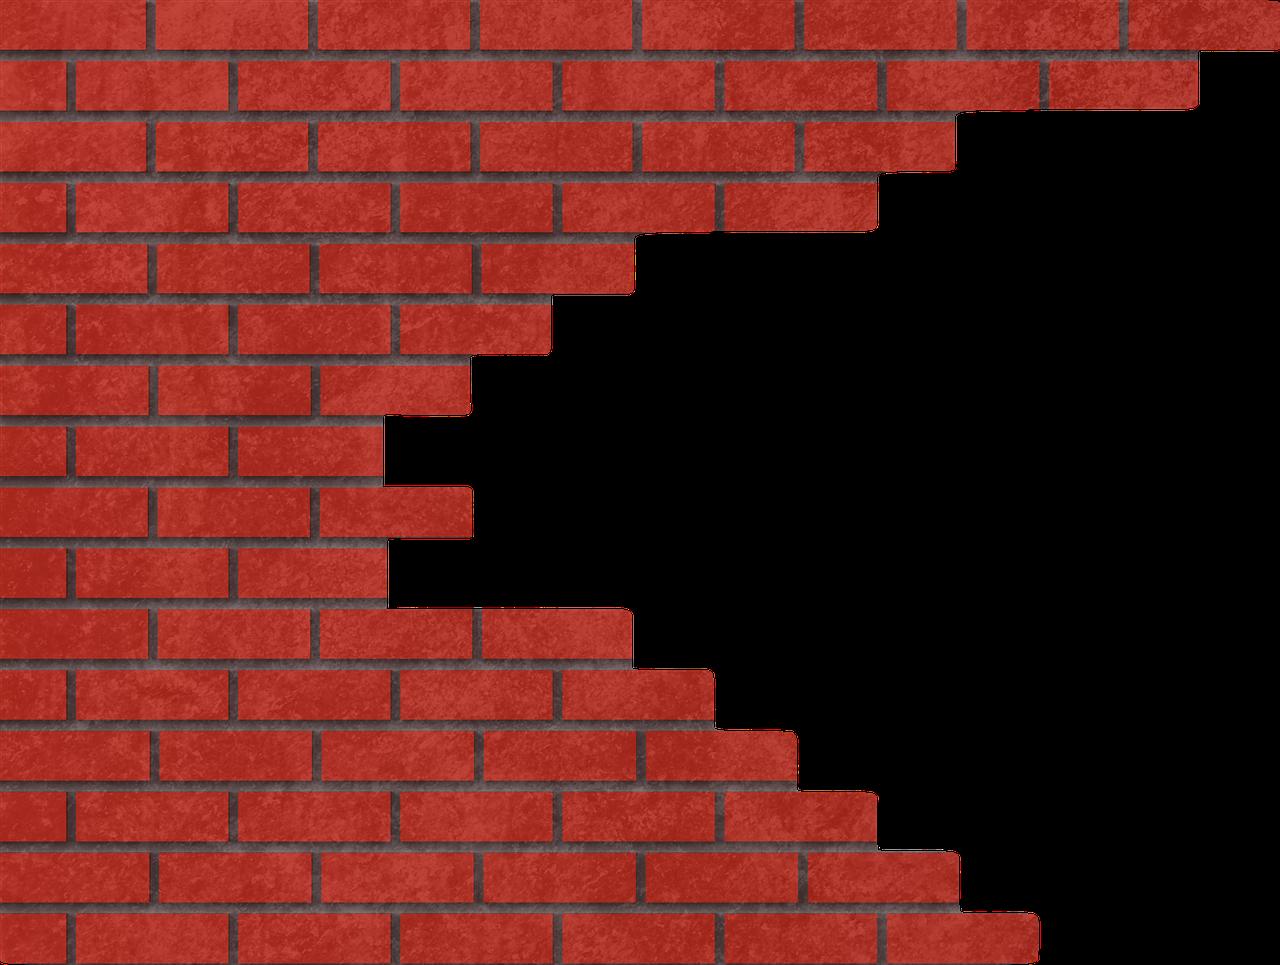 Download Bricks Wall Texture.